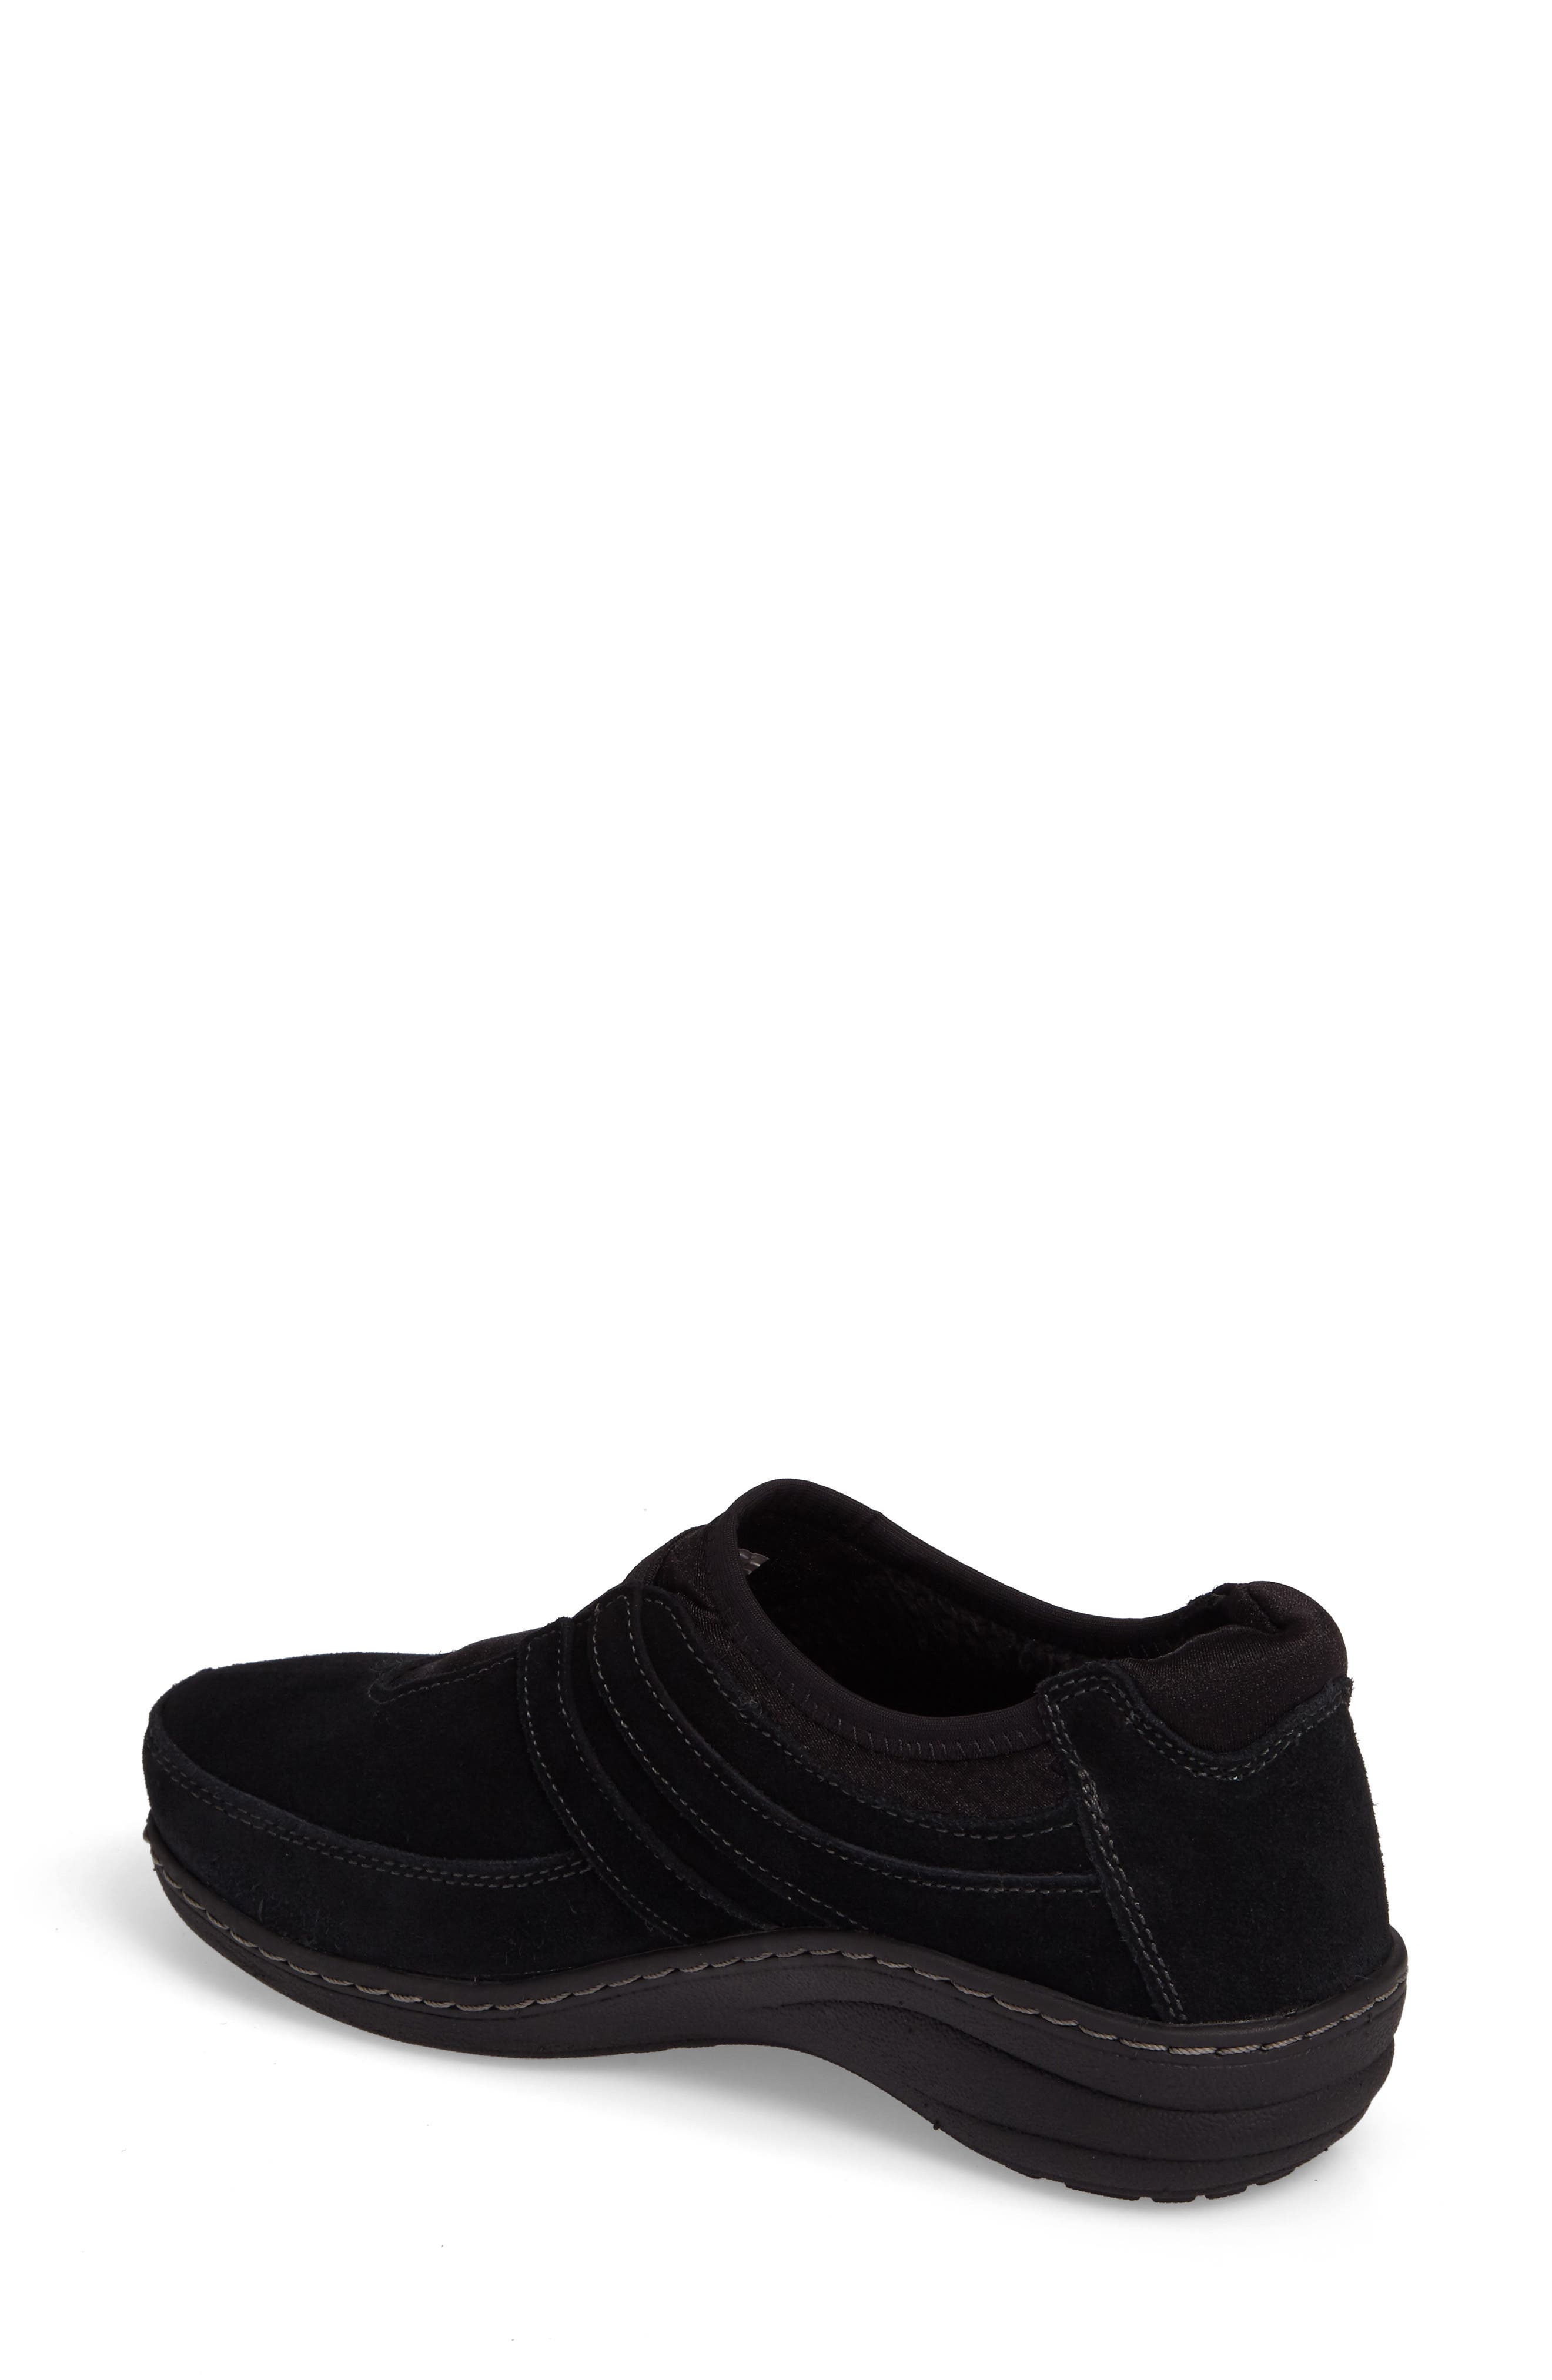 Alternate Image 2  - Aetrex Berries Slip-On Sneaker (Women)